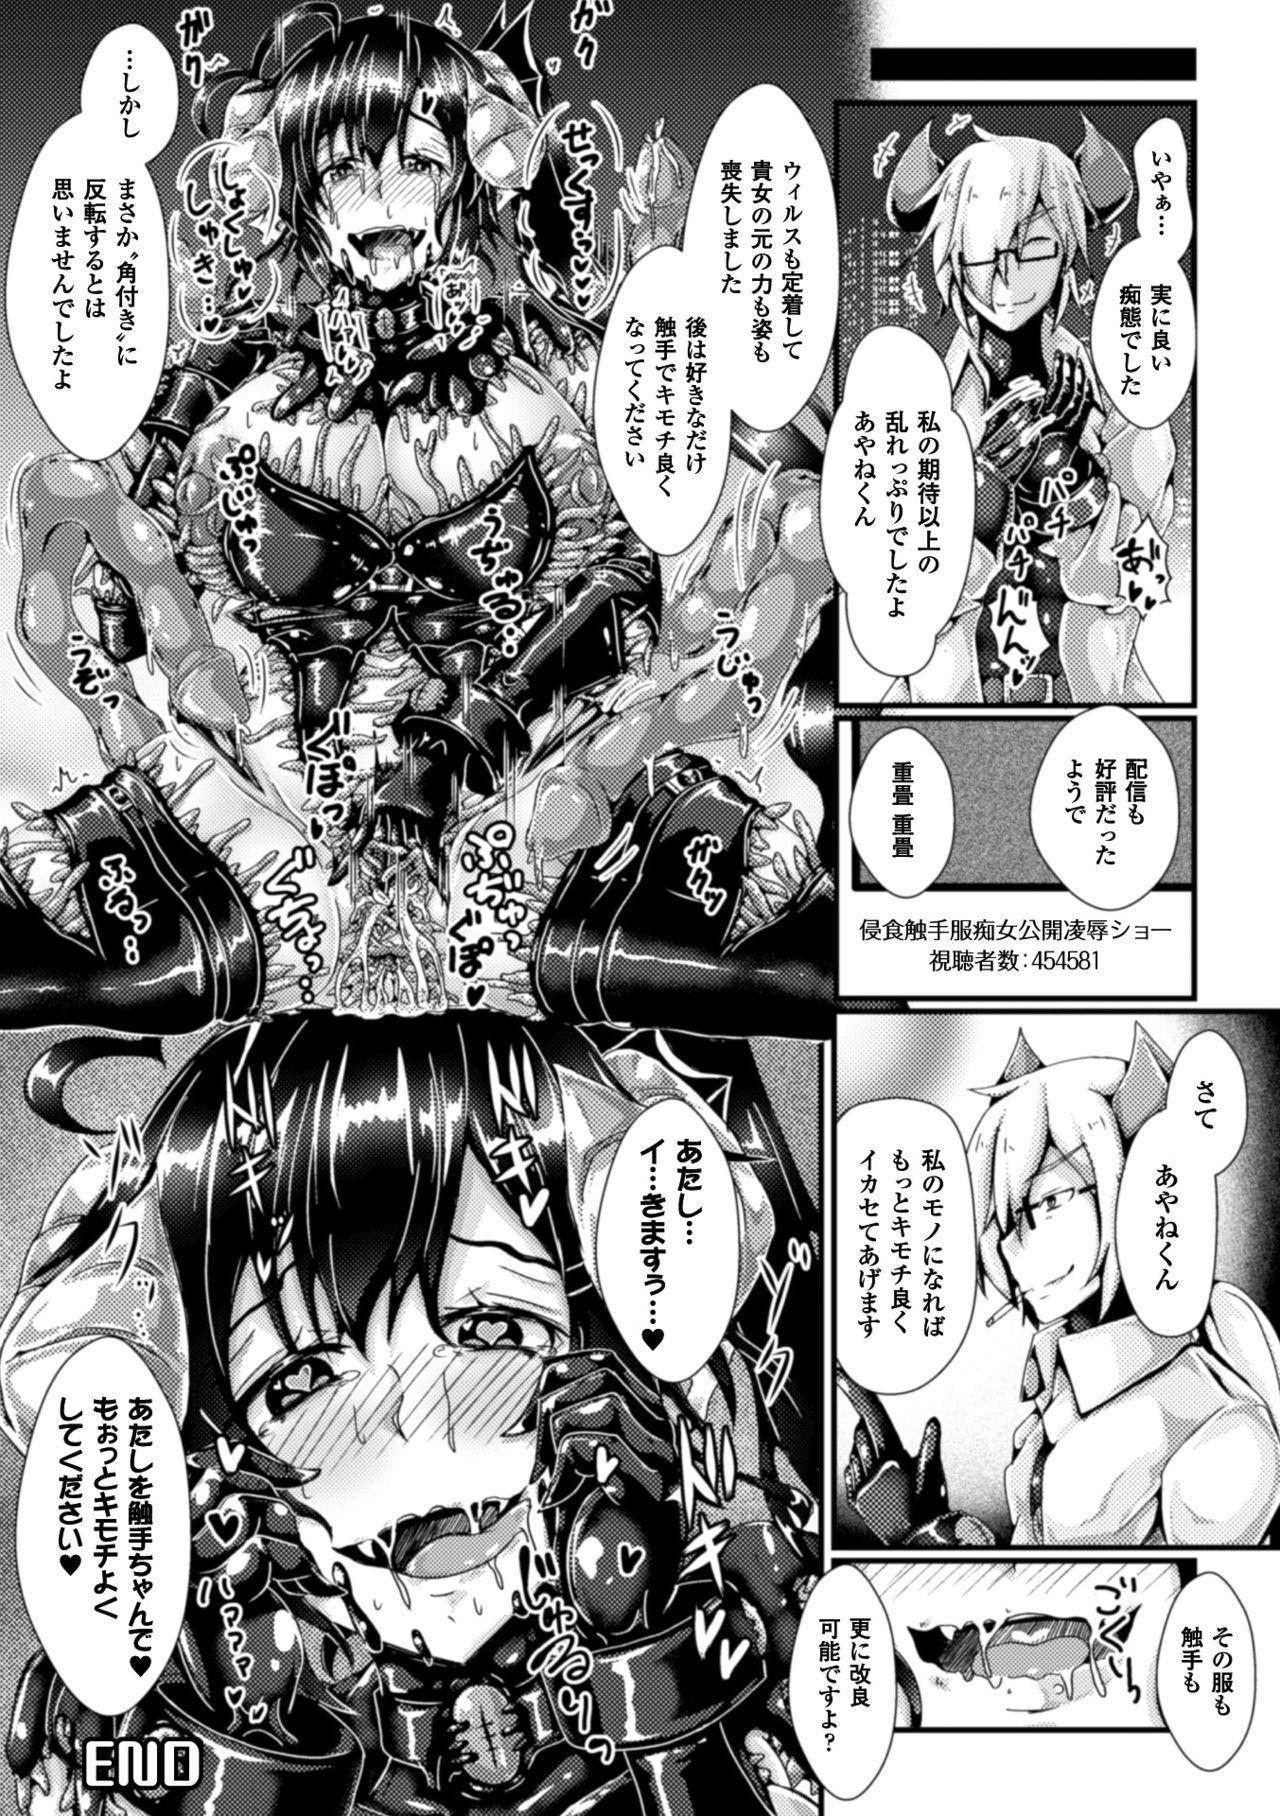 2D Comic Magazine Shokushu Yoroi ni Zenshin o Okasare Mugen Zecchou! Vol. 5 59